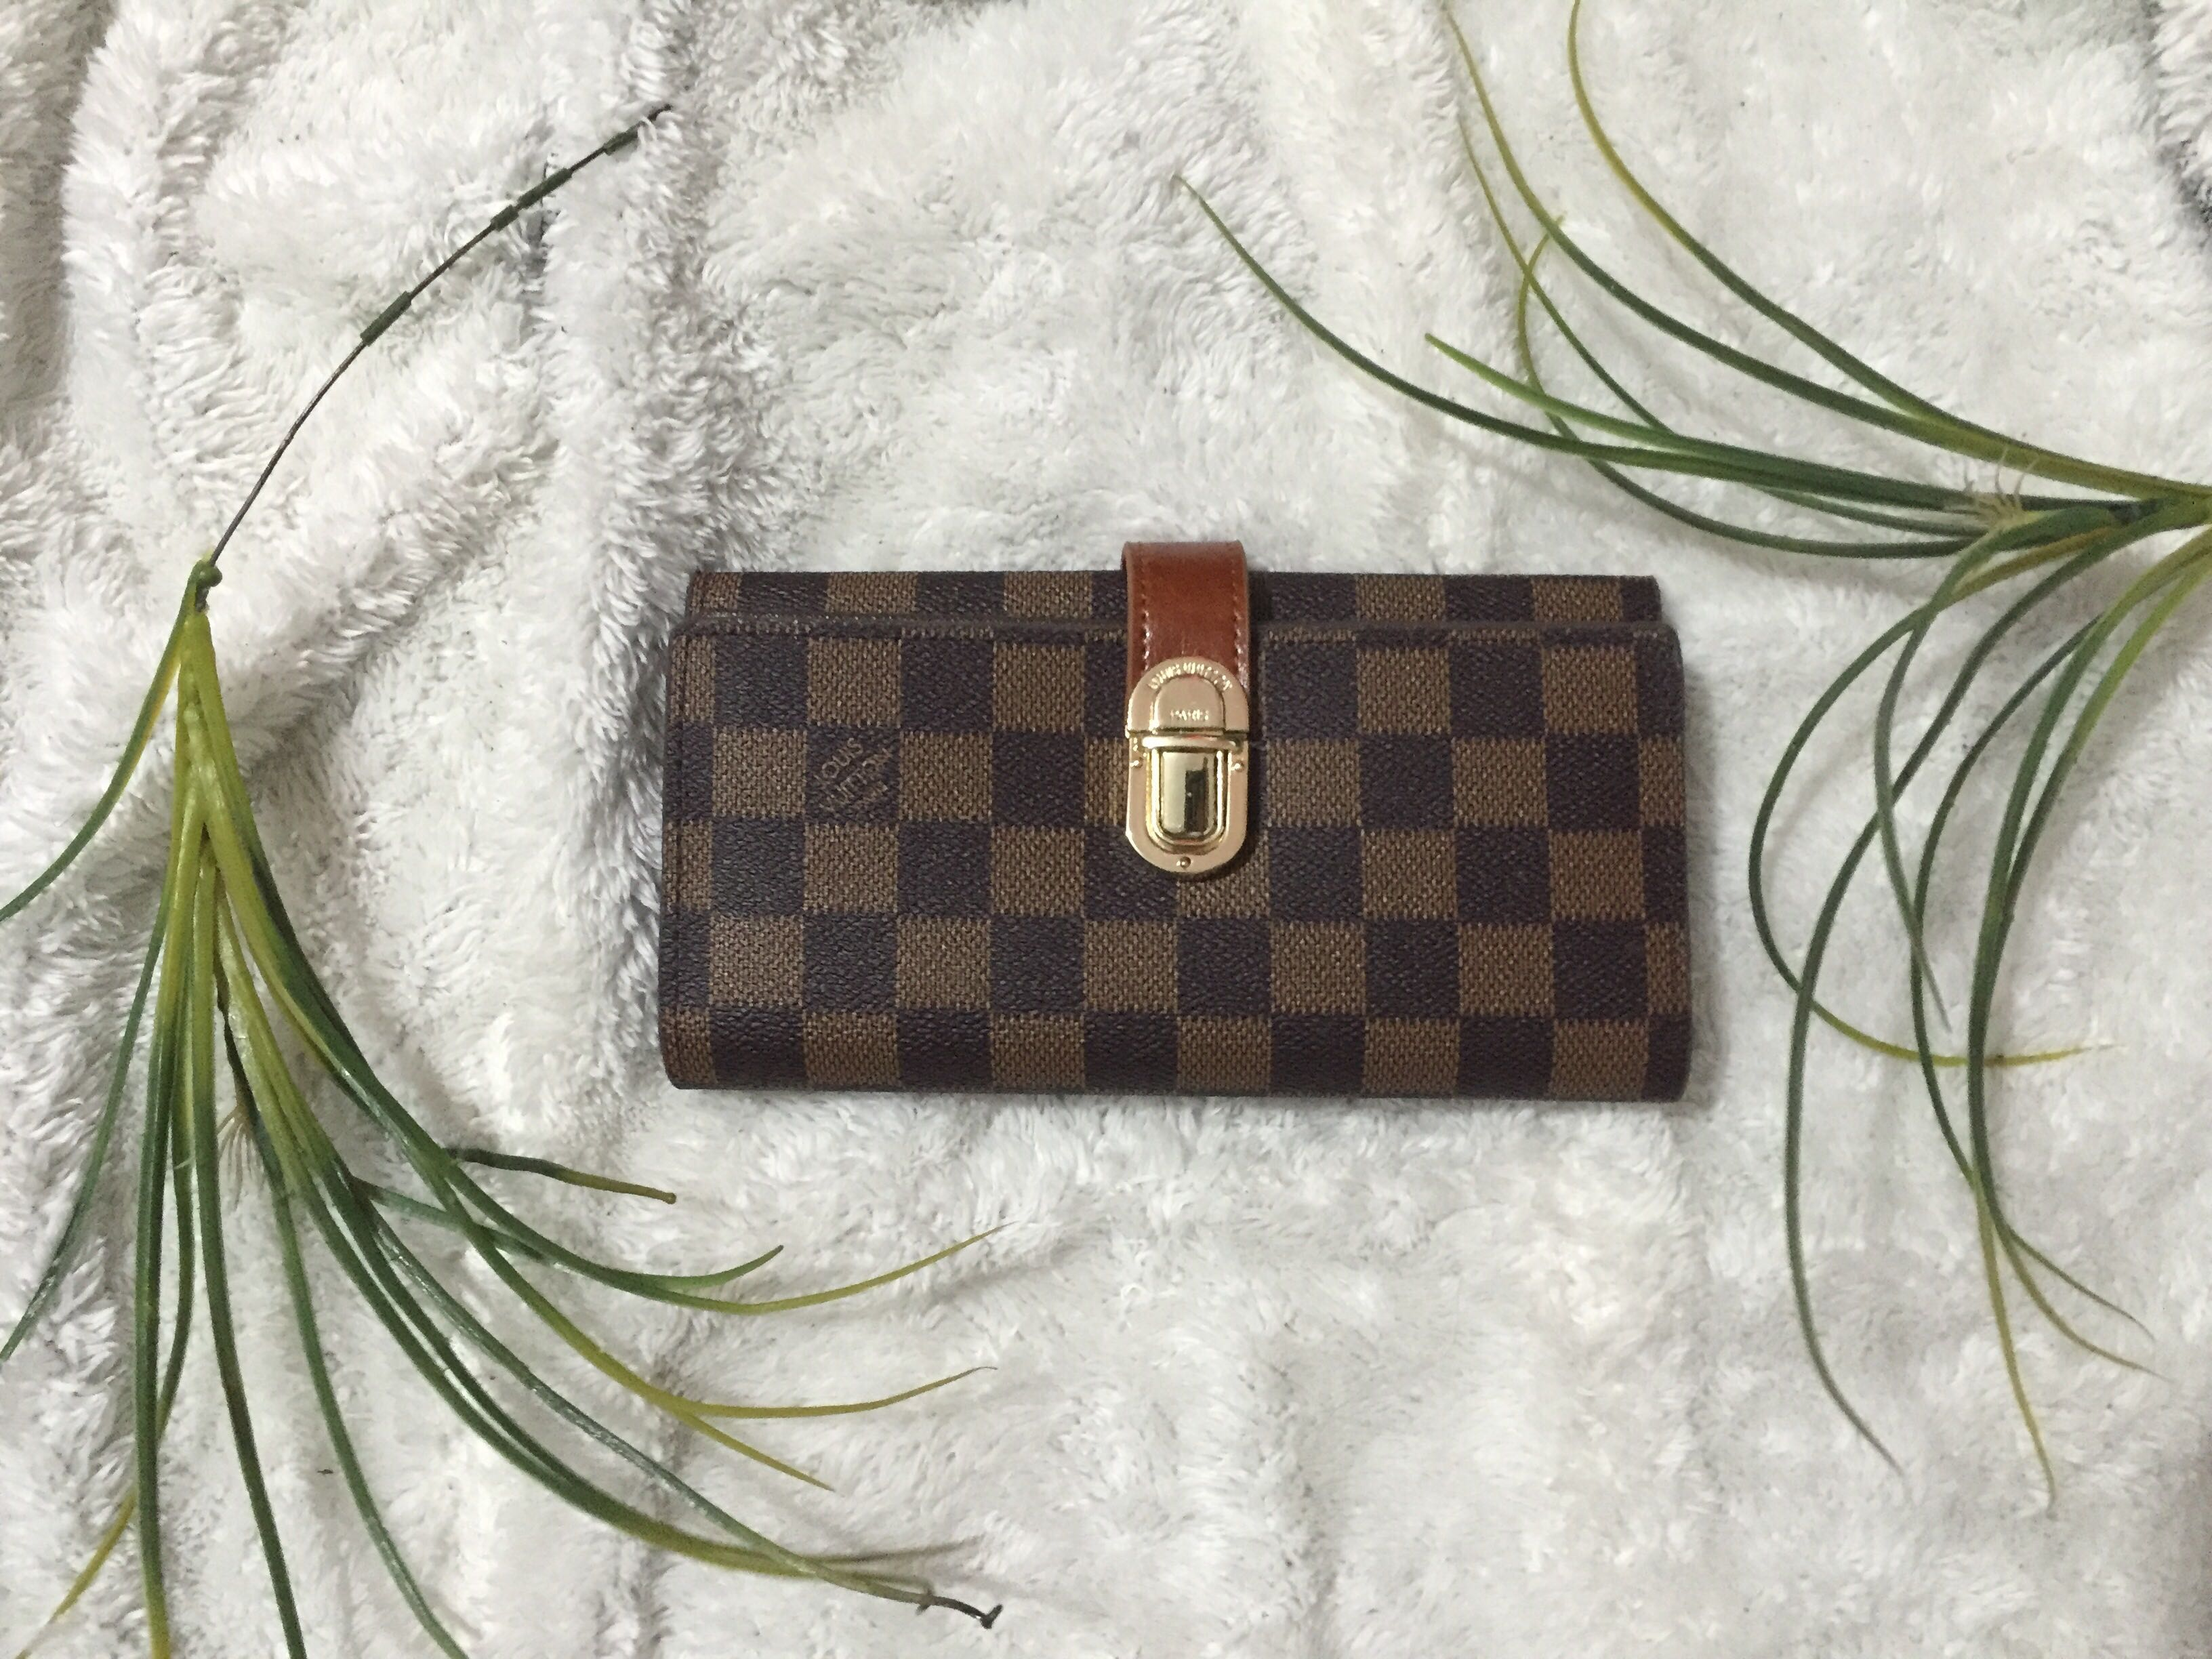 Louis Vuitton Long Wallet (FREE SHIPPING), Preloved Women s Fashion ... 92f4b0251b